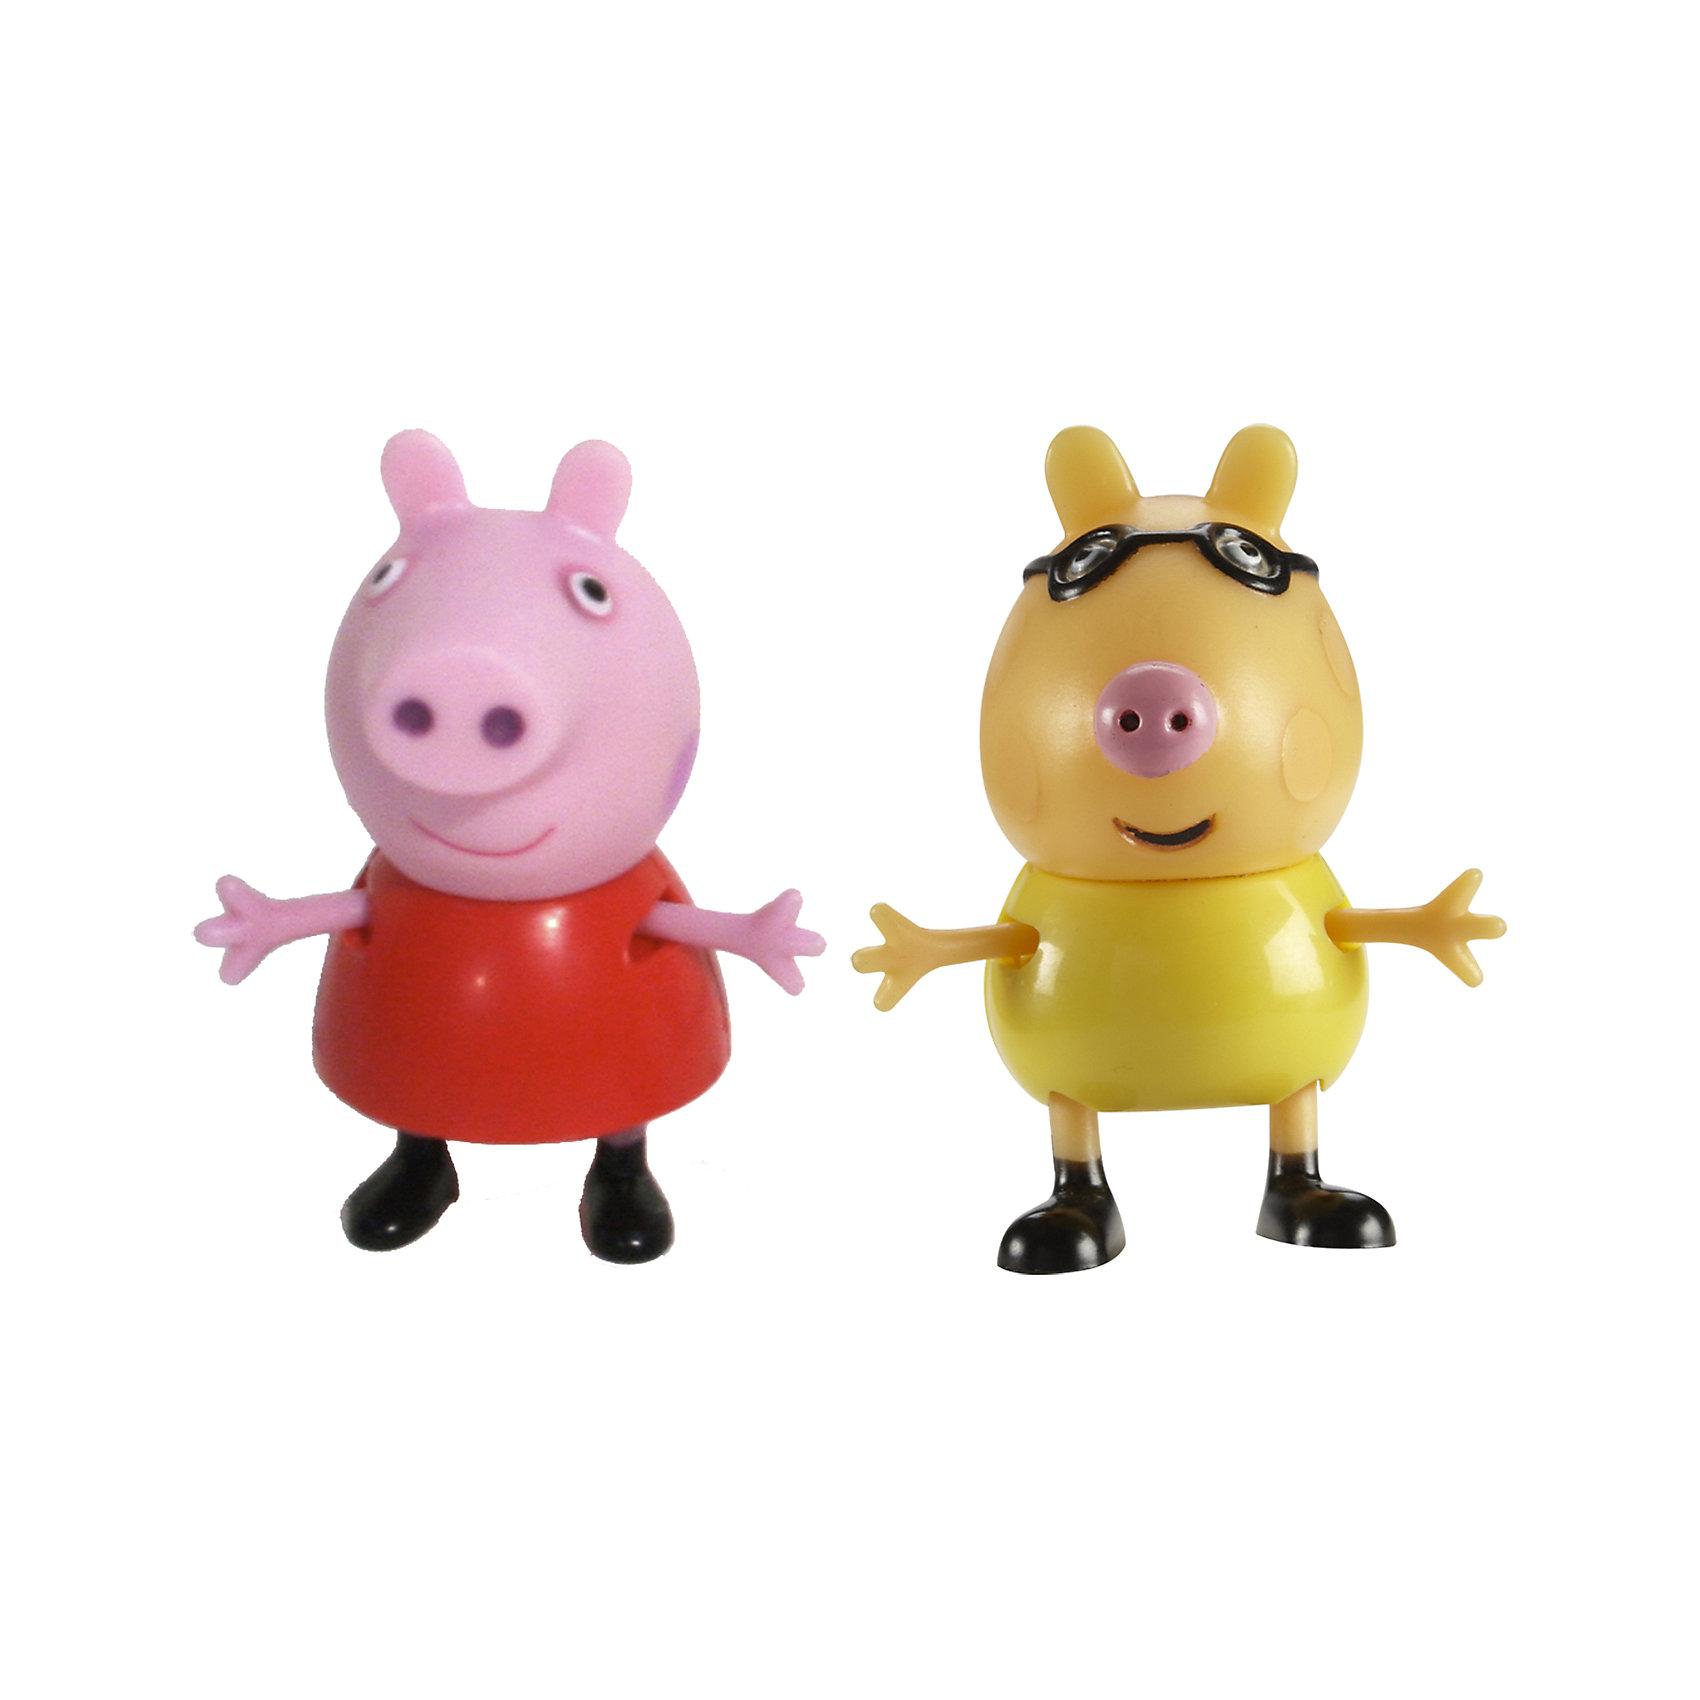 Росмэн Игровой набор Пеппа и Педро, Свинка Пеппа росмэн игровой набор поезд пеппы неваляшки свинка пеппа